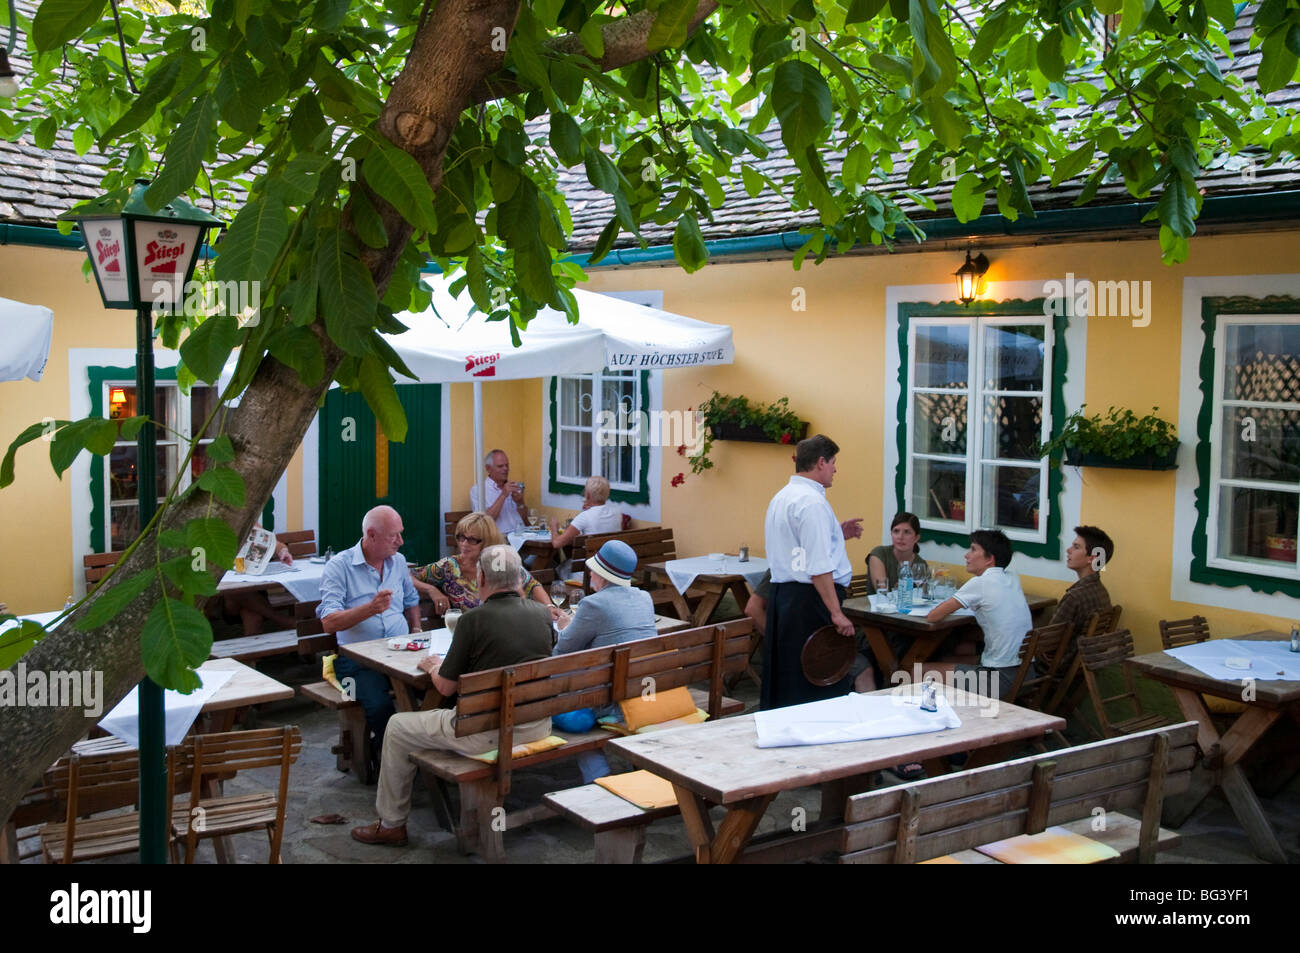 City Streets Restaurant